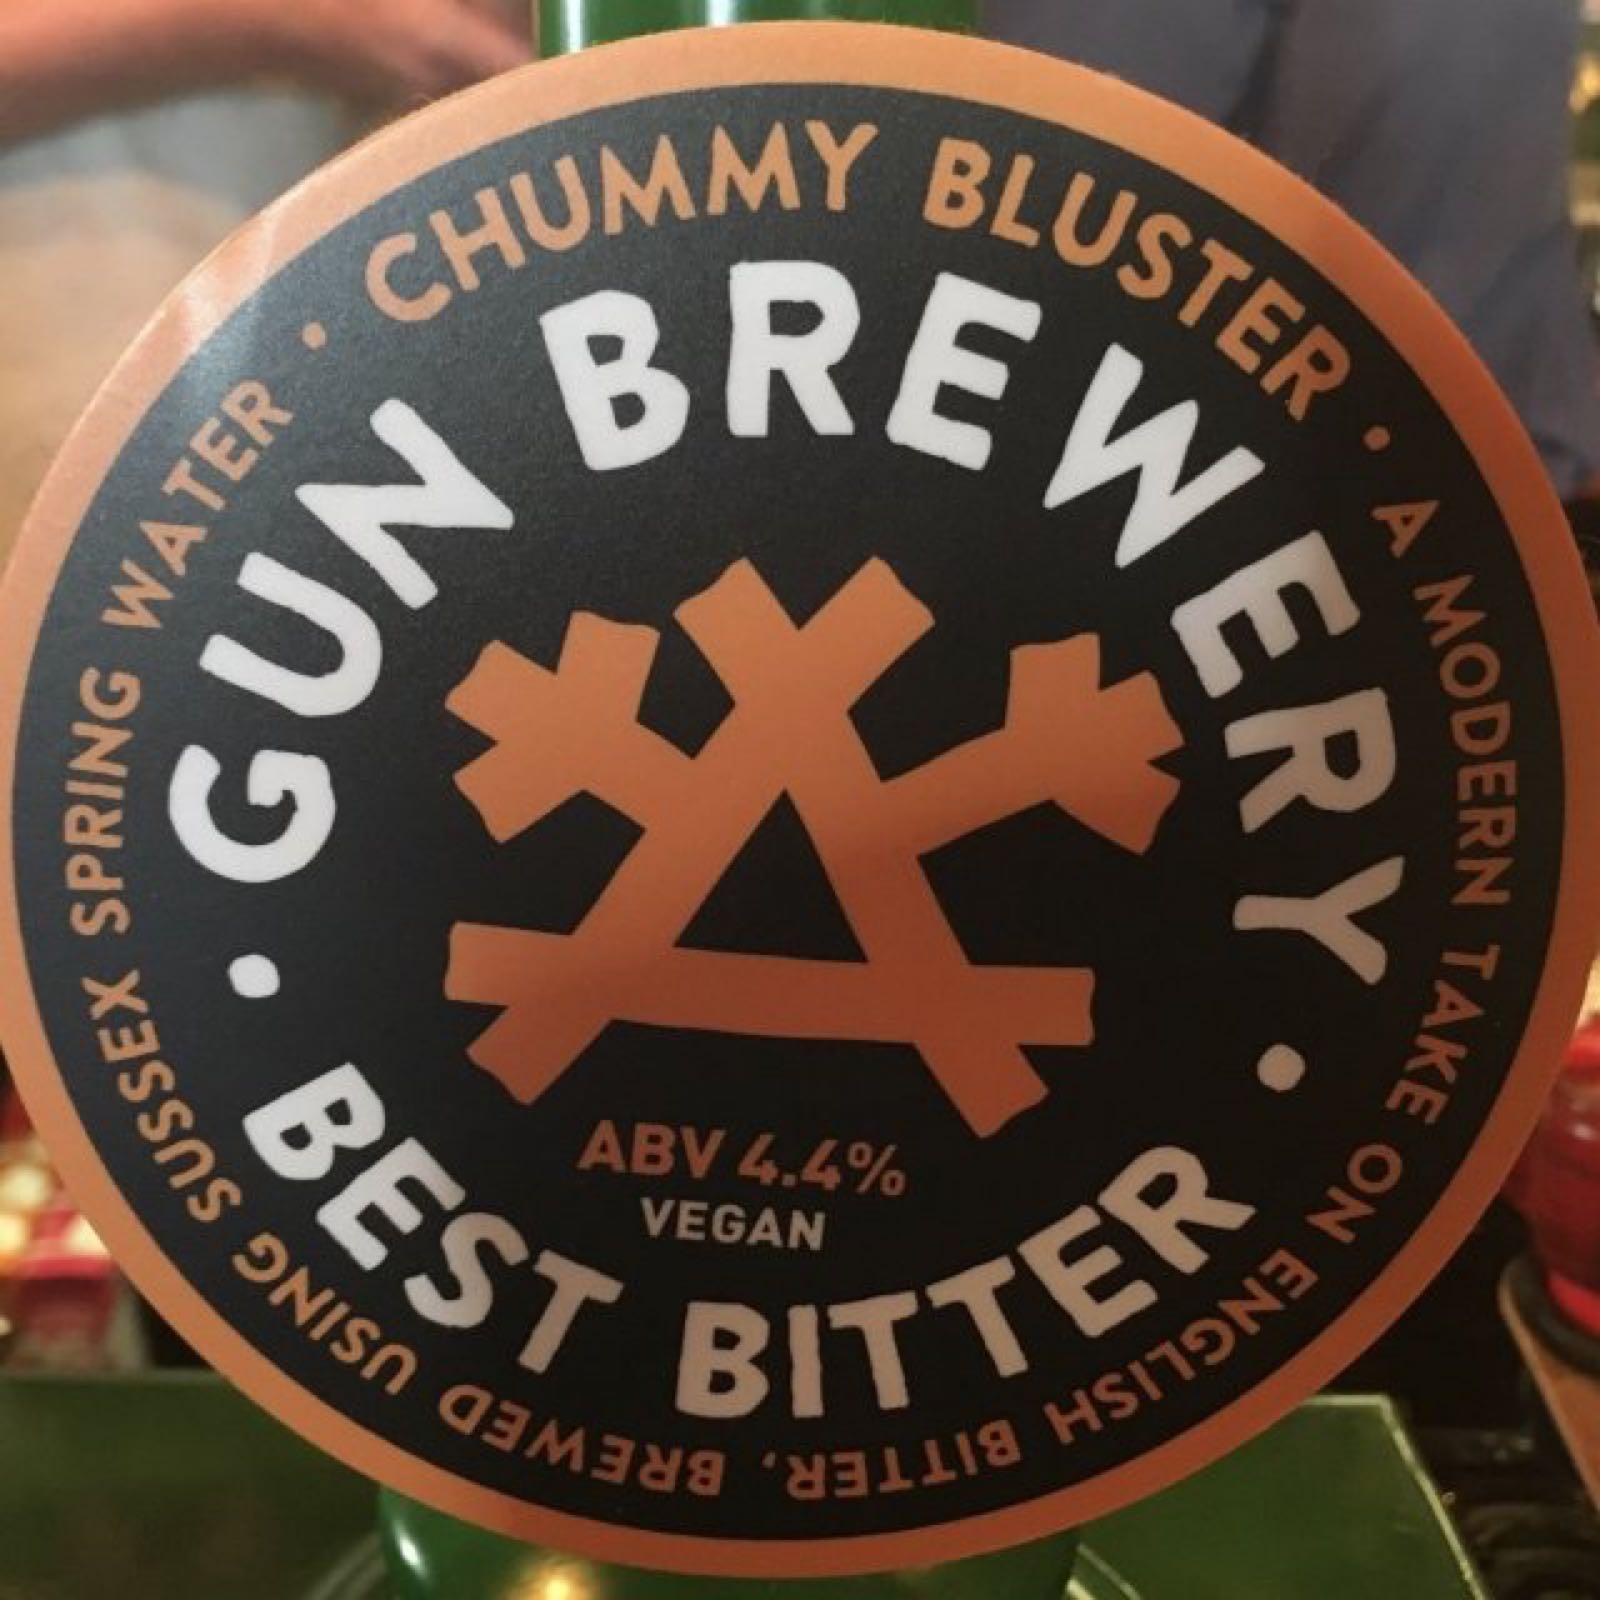 Gun Chummy Bluster